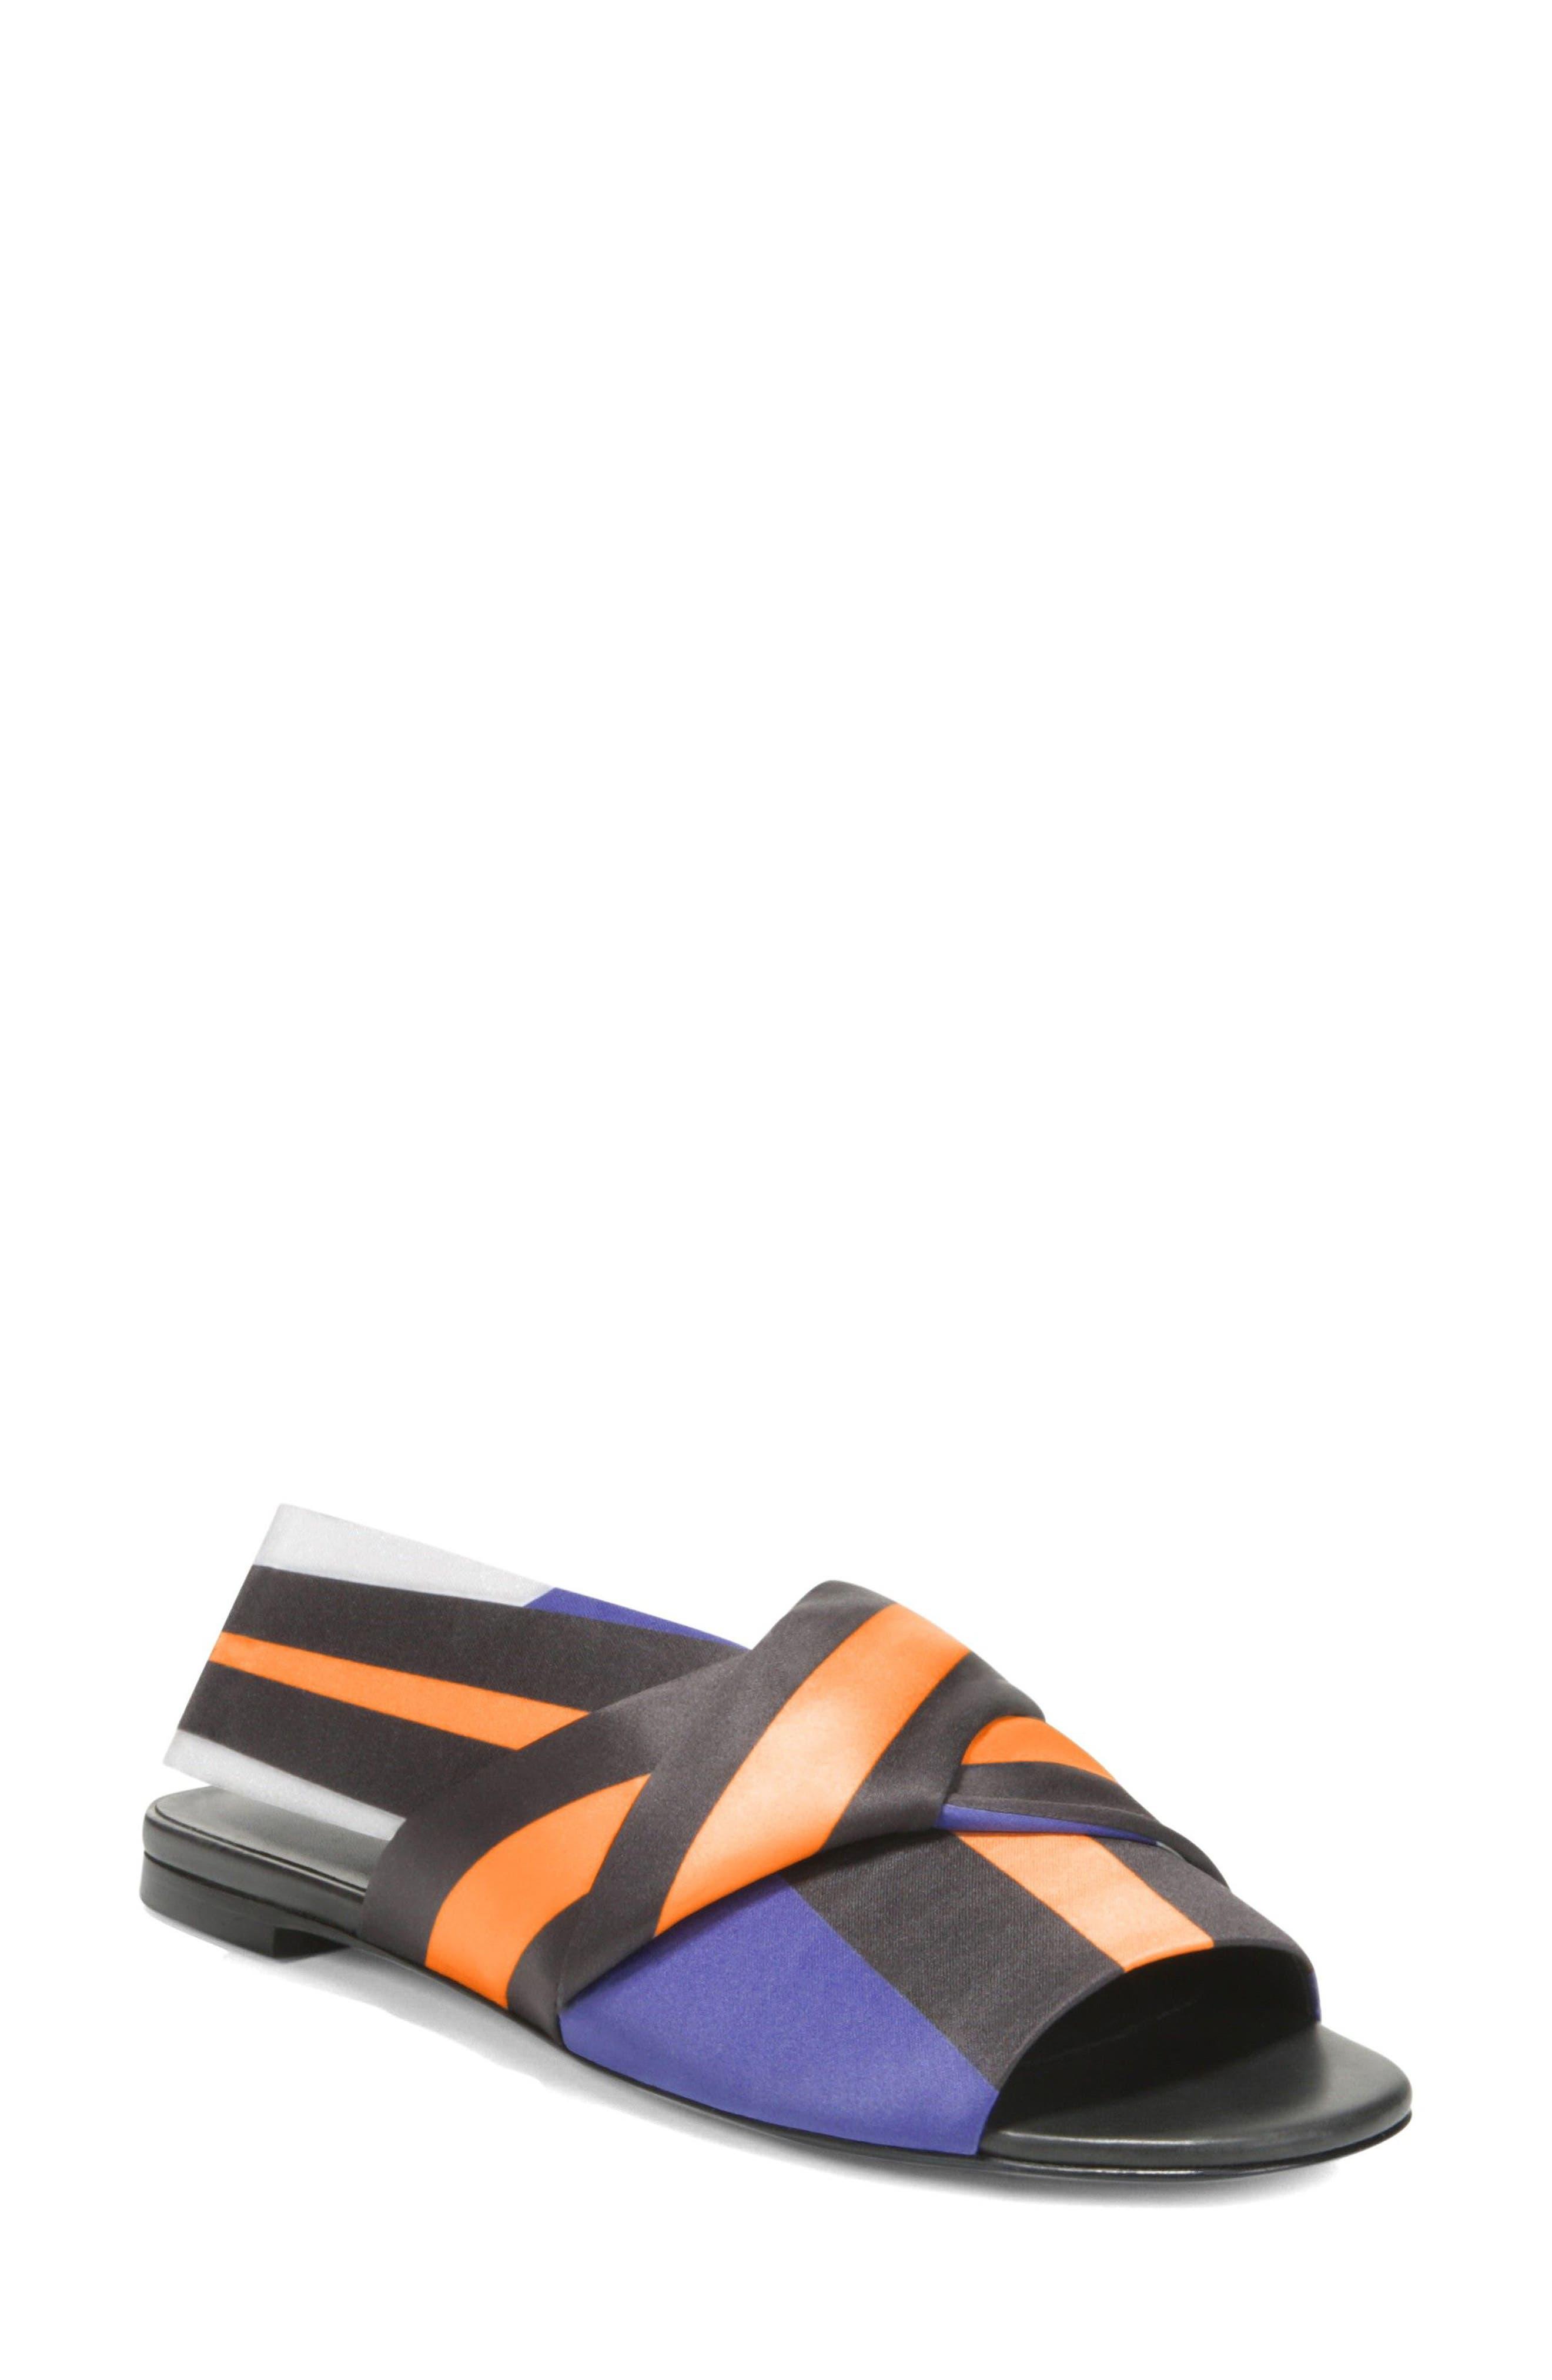 Halina Slide Sandal,                         Main,                         color, Sapphire/ Wine Fabric